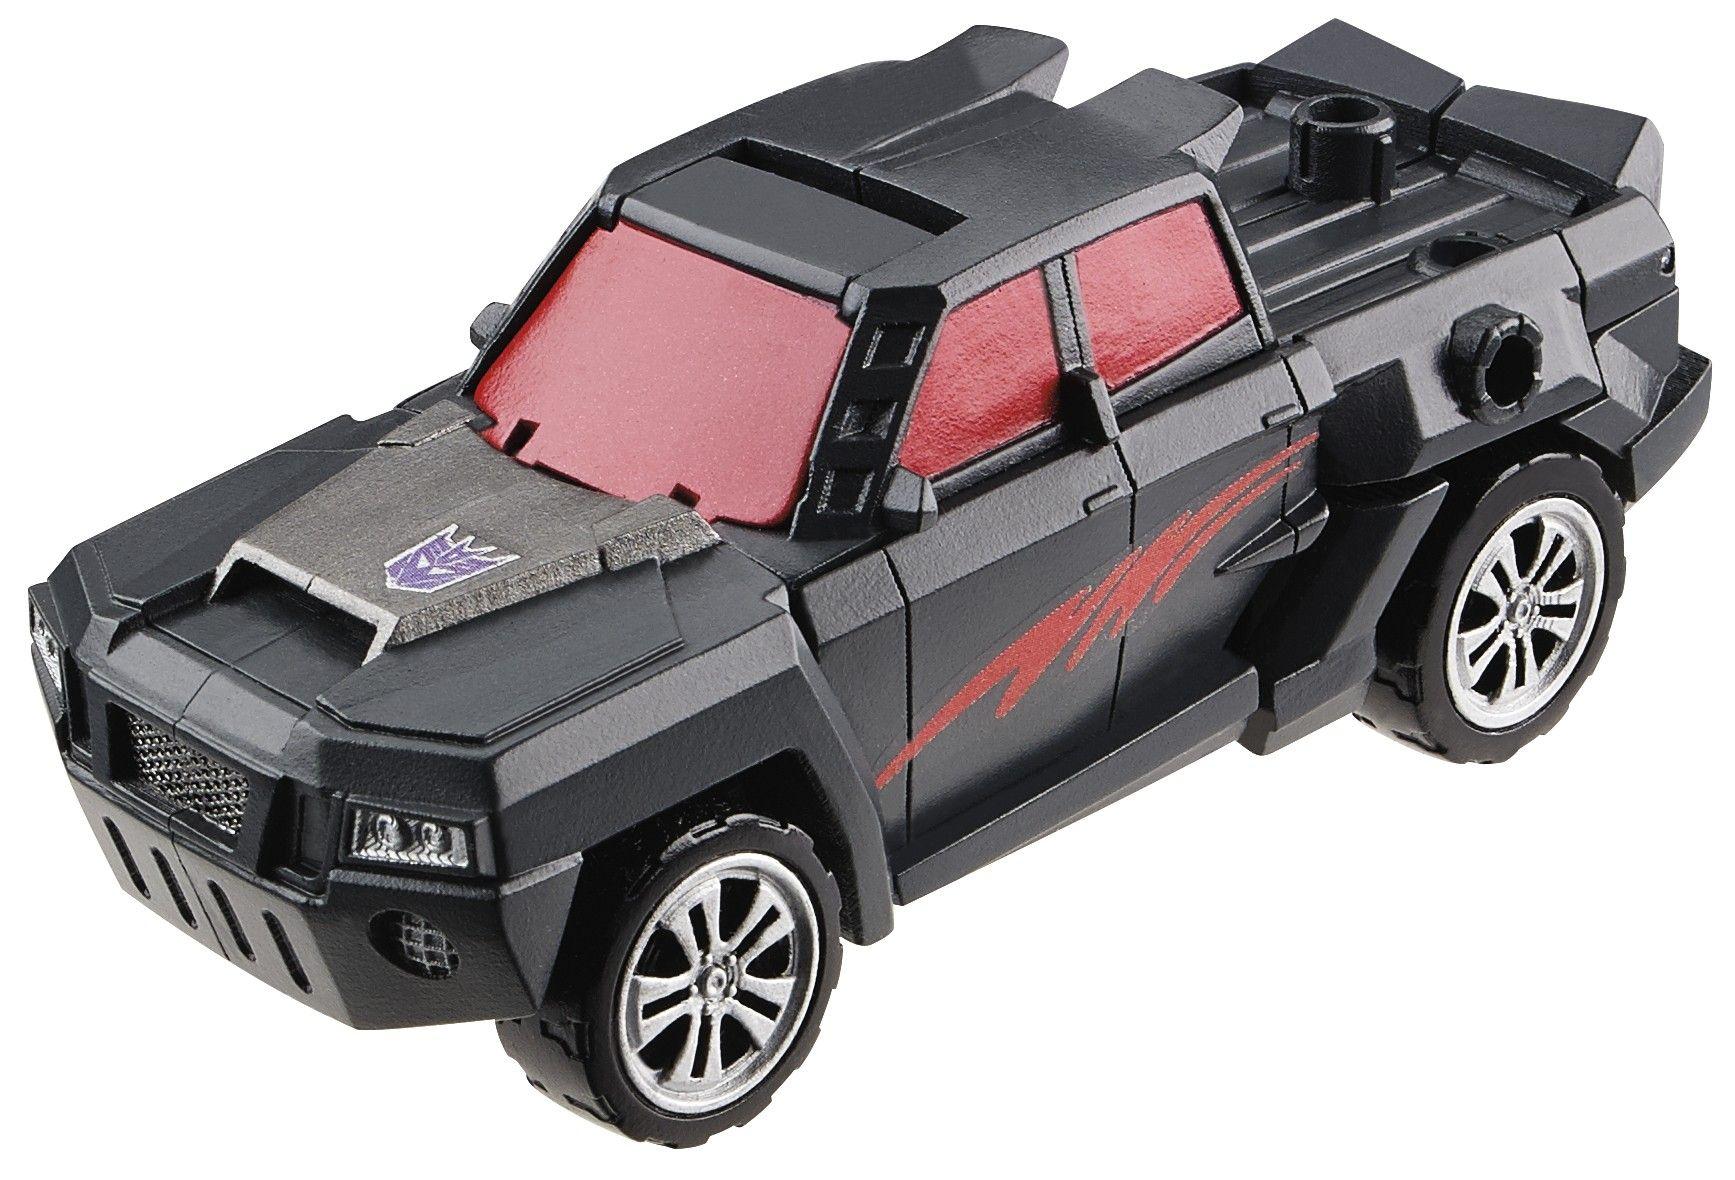 Hasbro - Transformers: Generations - Deluxe - Offroad/Wildrider